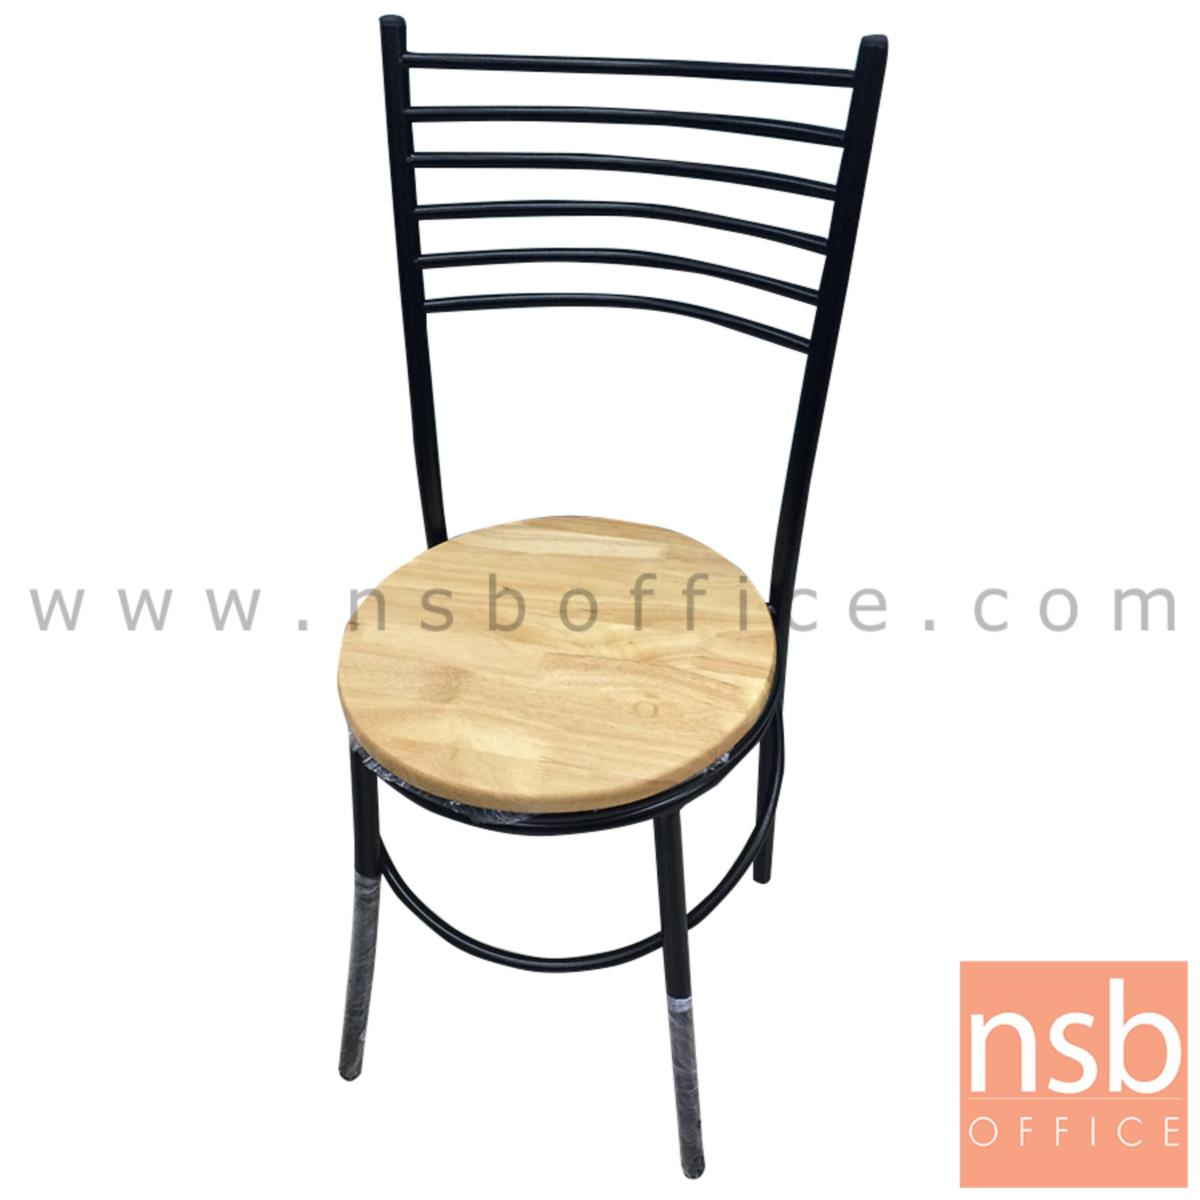 B20A089:เก้าอี้อเนกประสงค์เหล็ก รุ่น Ardie (อาร์ดี้)  ขาเหล็กพ่นดำ